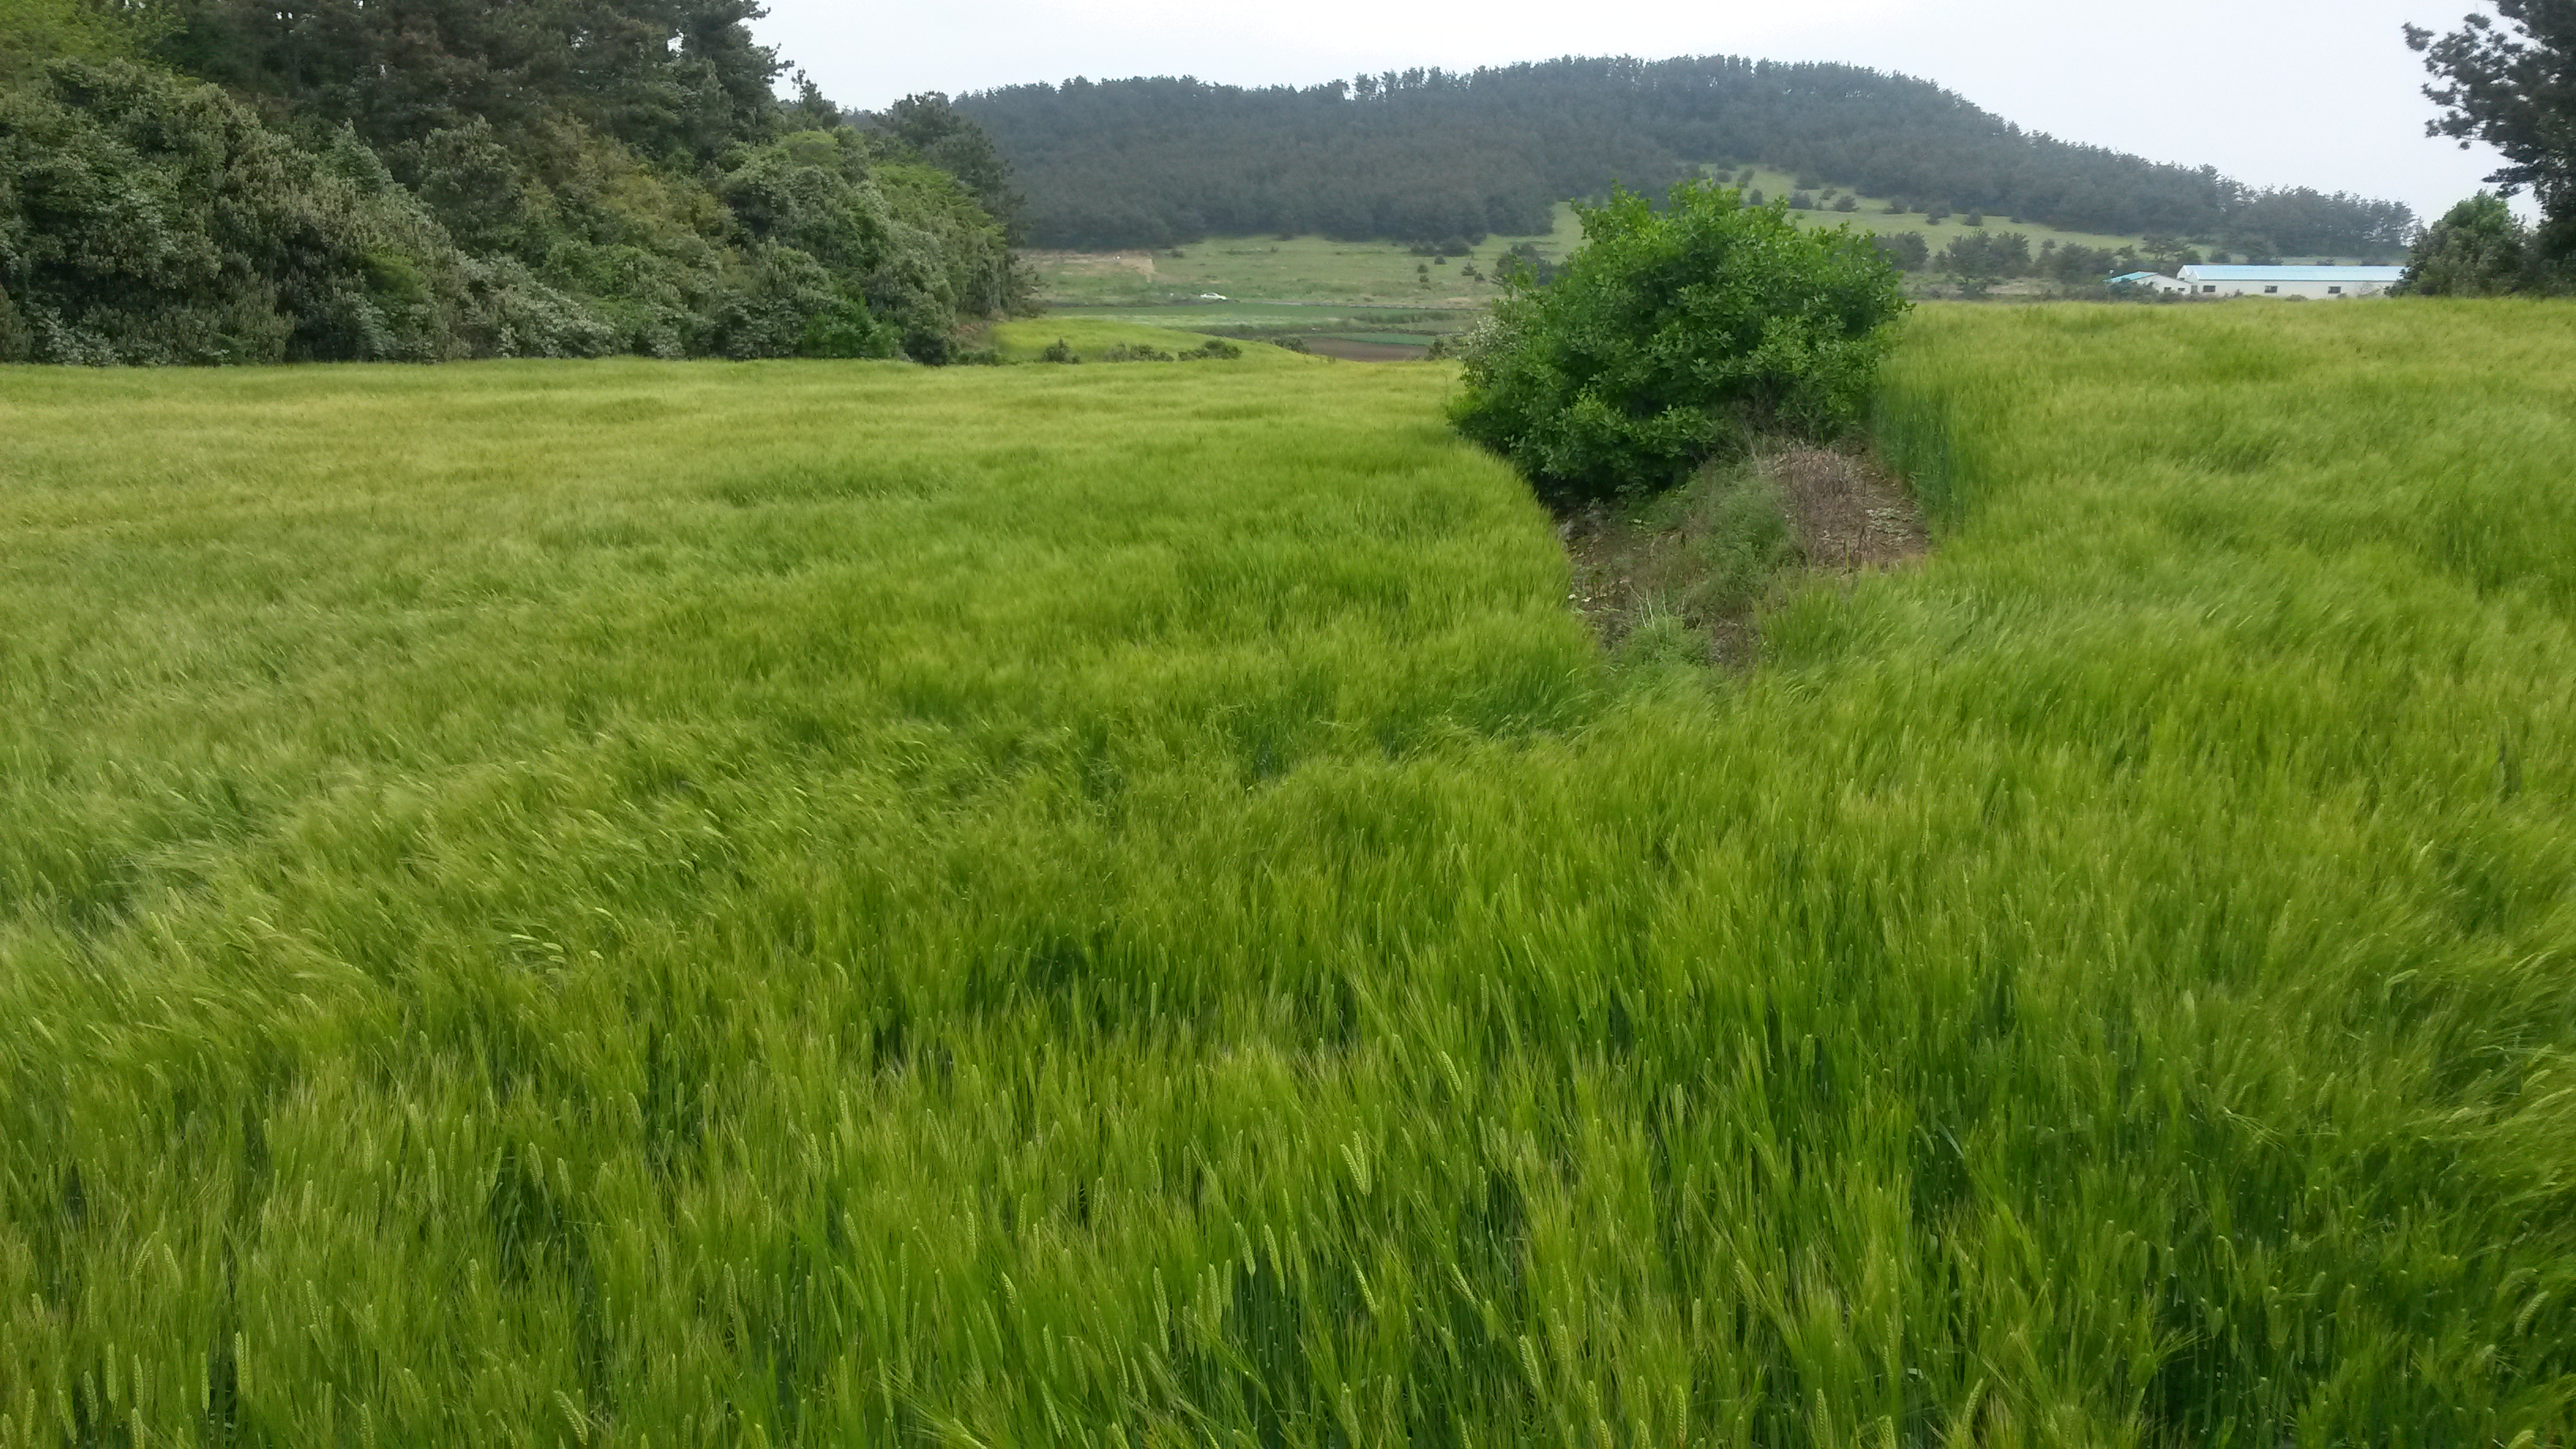 Barley fields along the West Coast